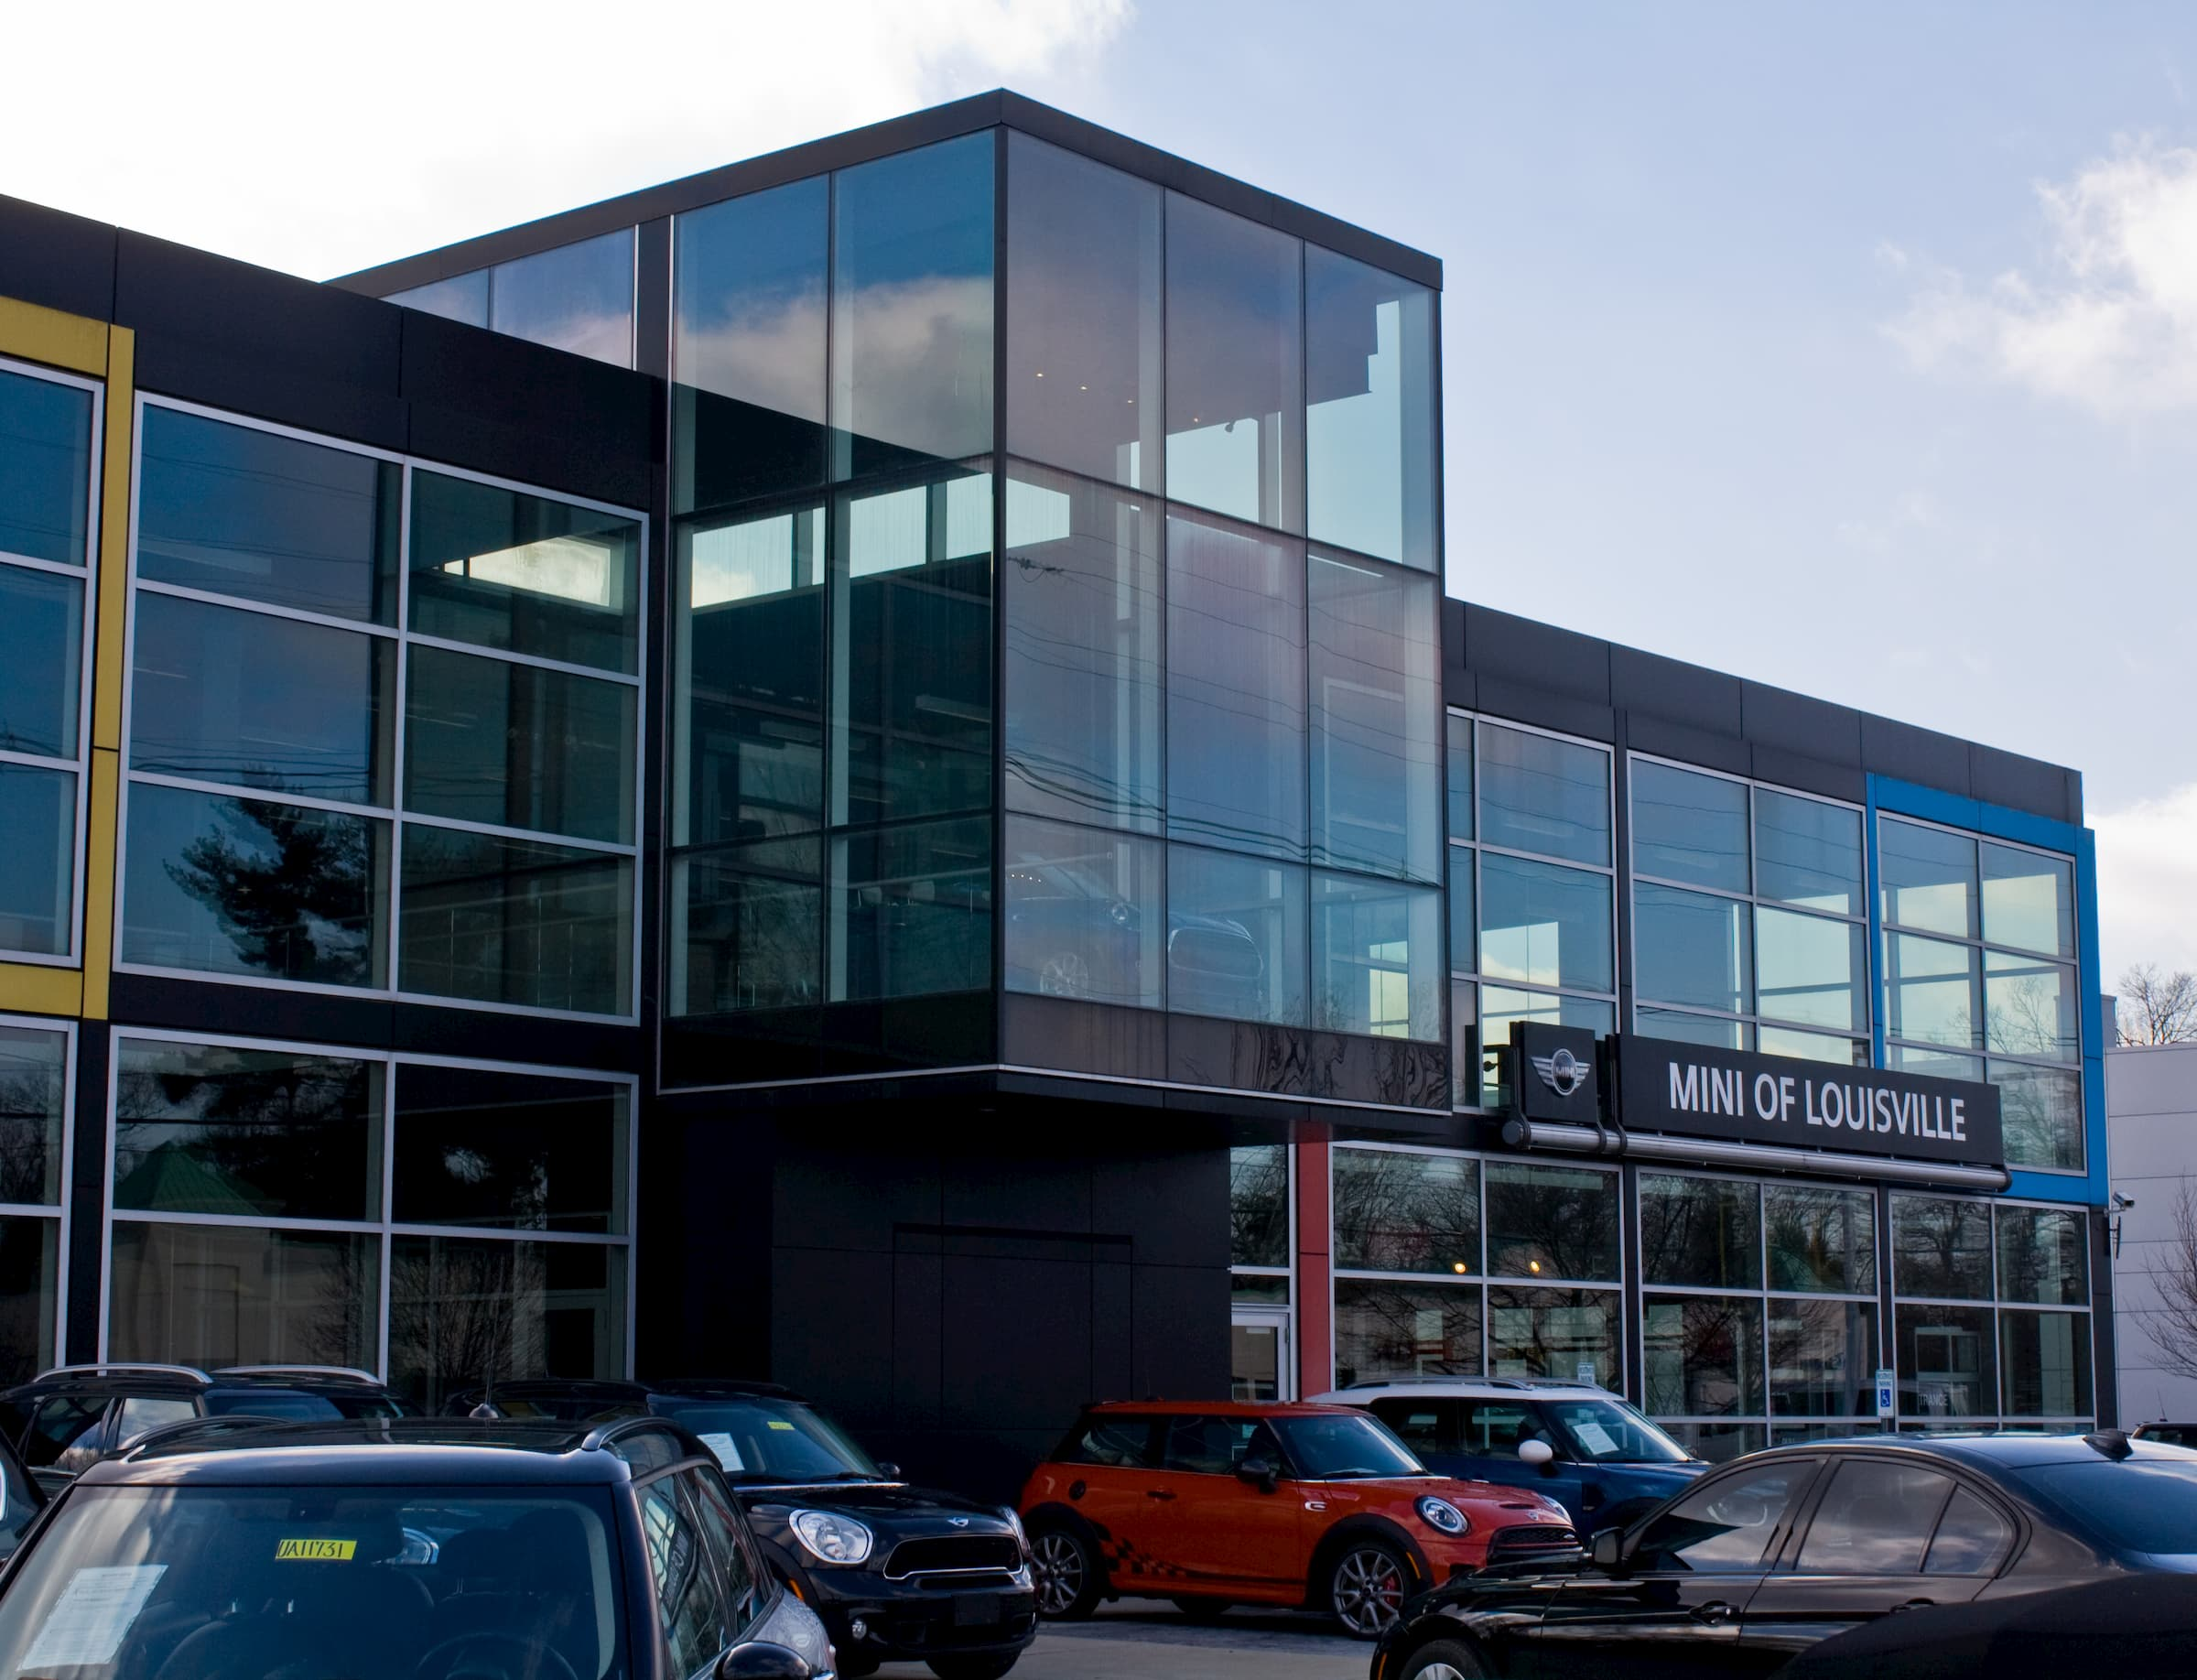 Glass windows and a glass facade on a car dealership